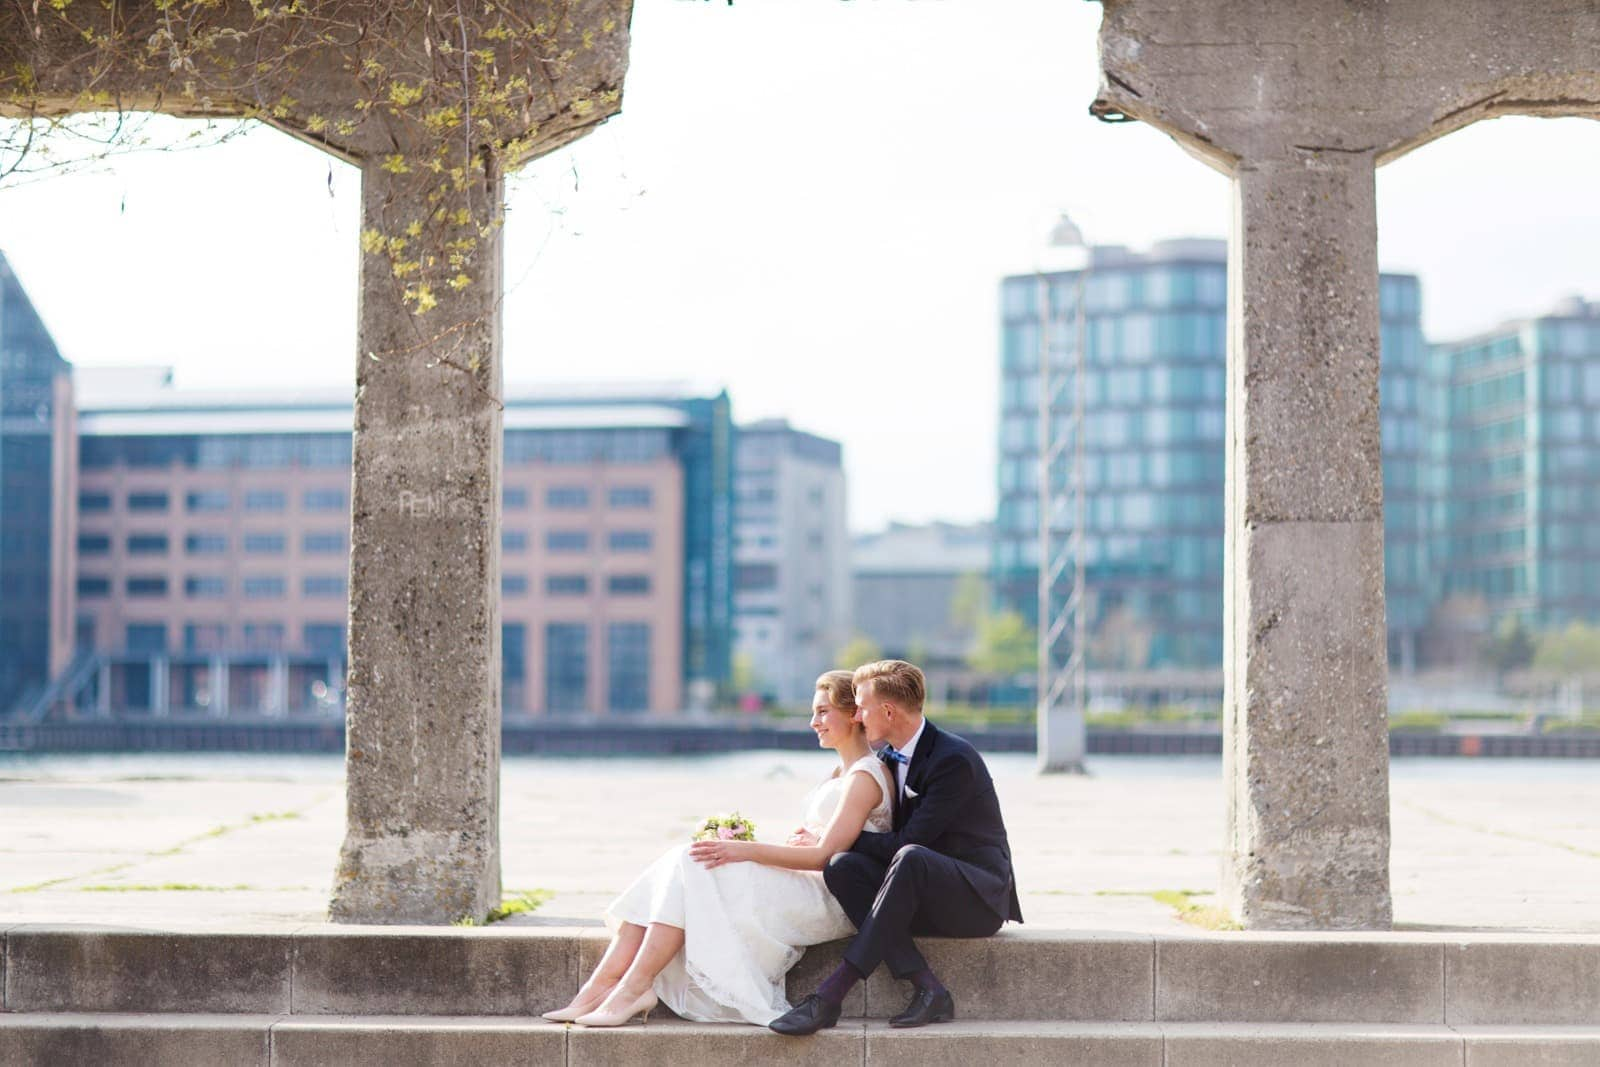 Islandsbrygge - Location til bryllup